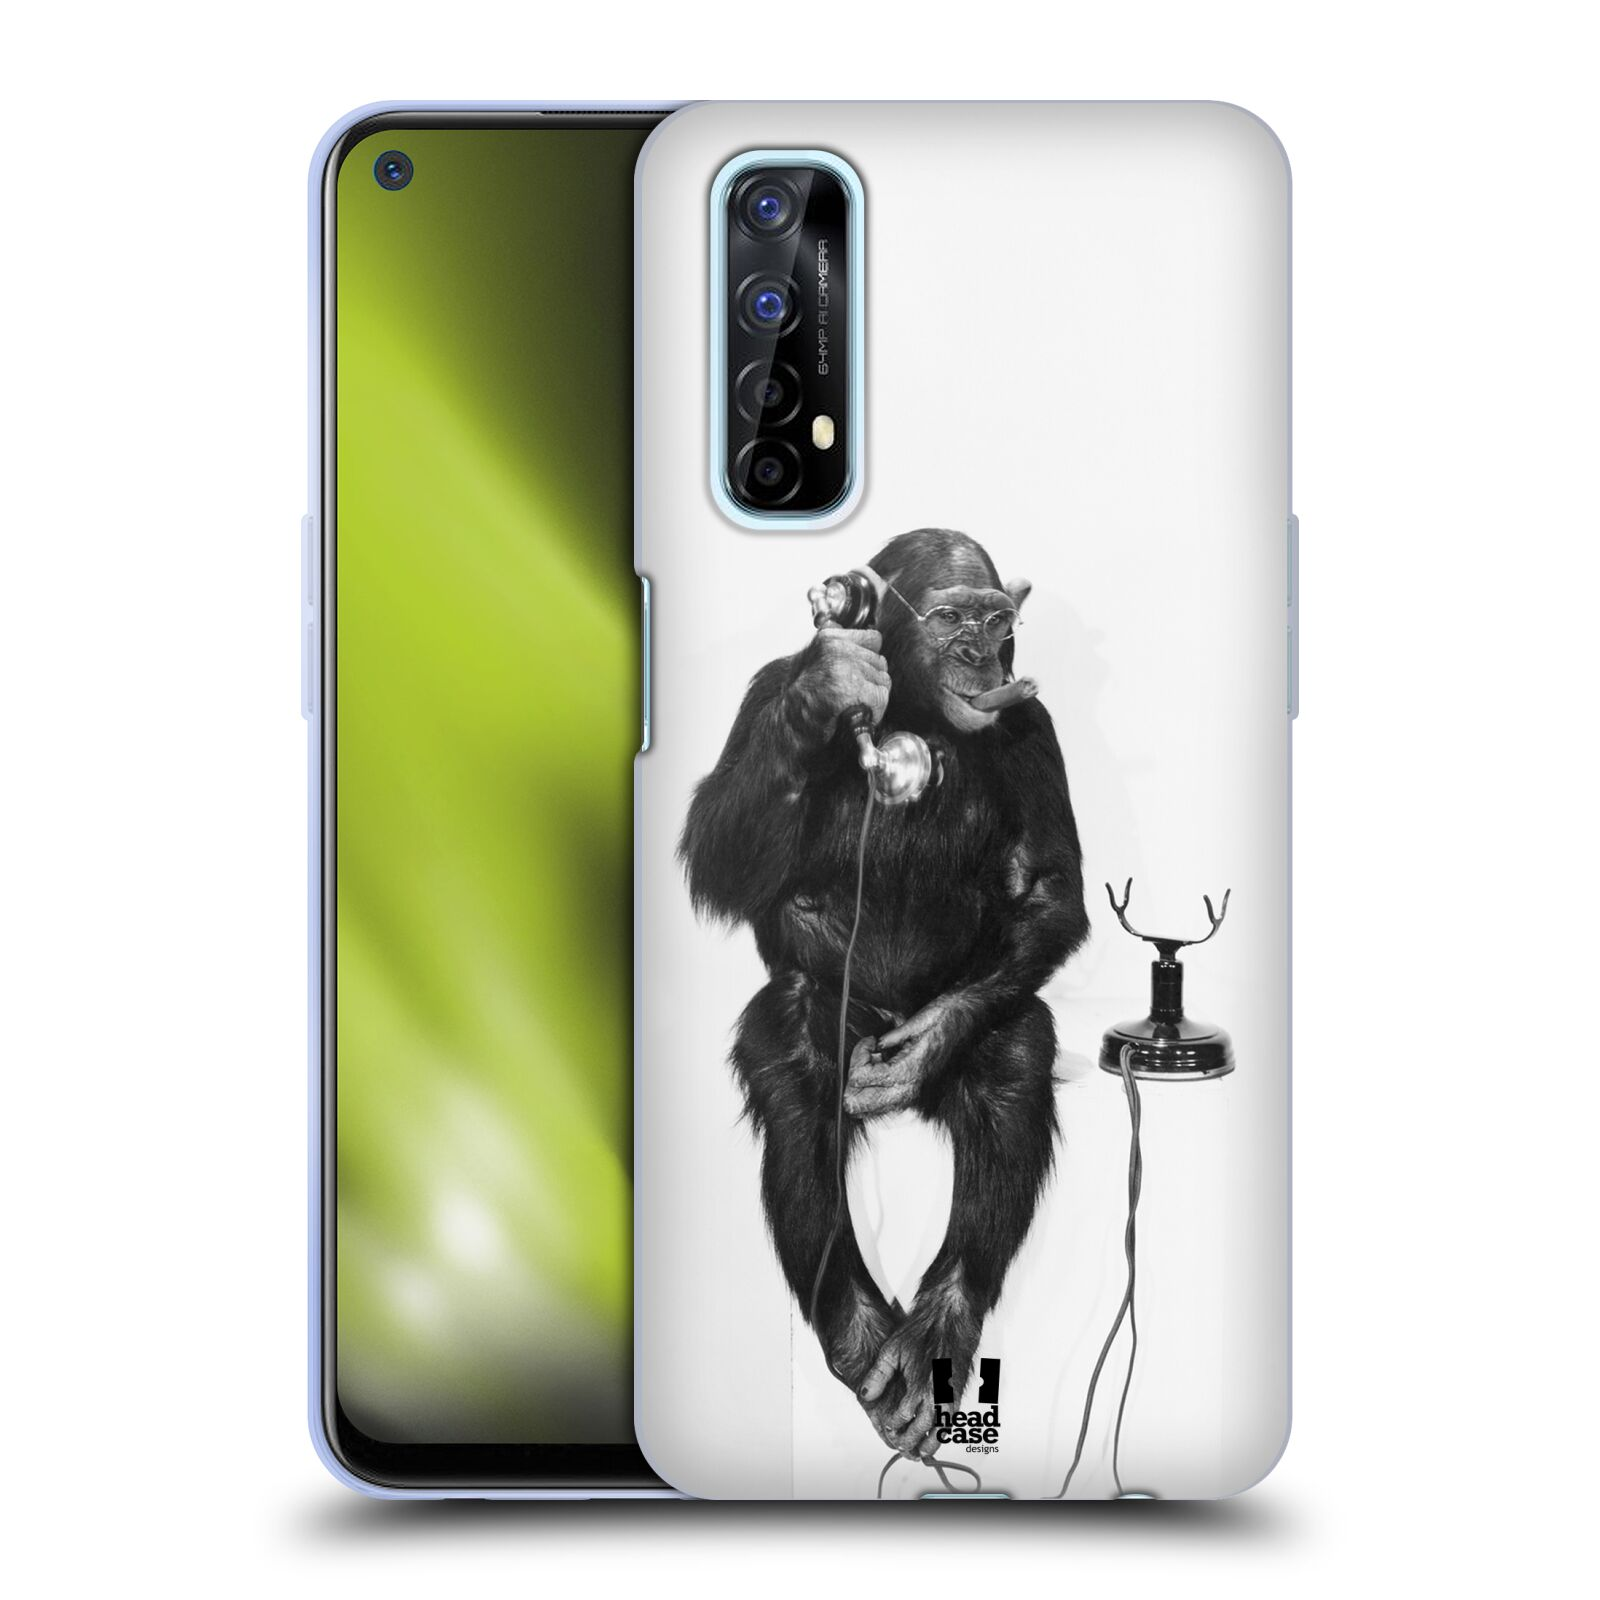 Silikonové pouzdro na mobil Realme 7 - Head Case - OPIČÁK S TELEFONEM